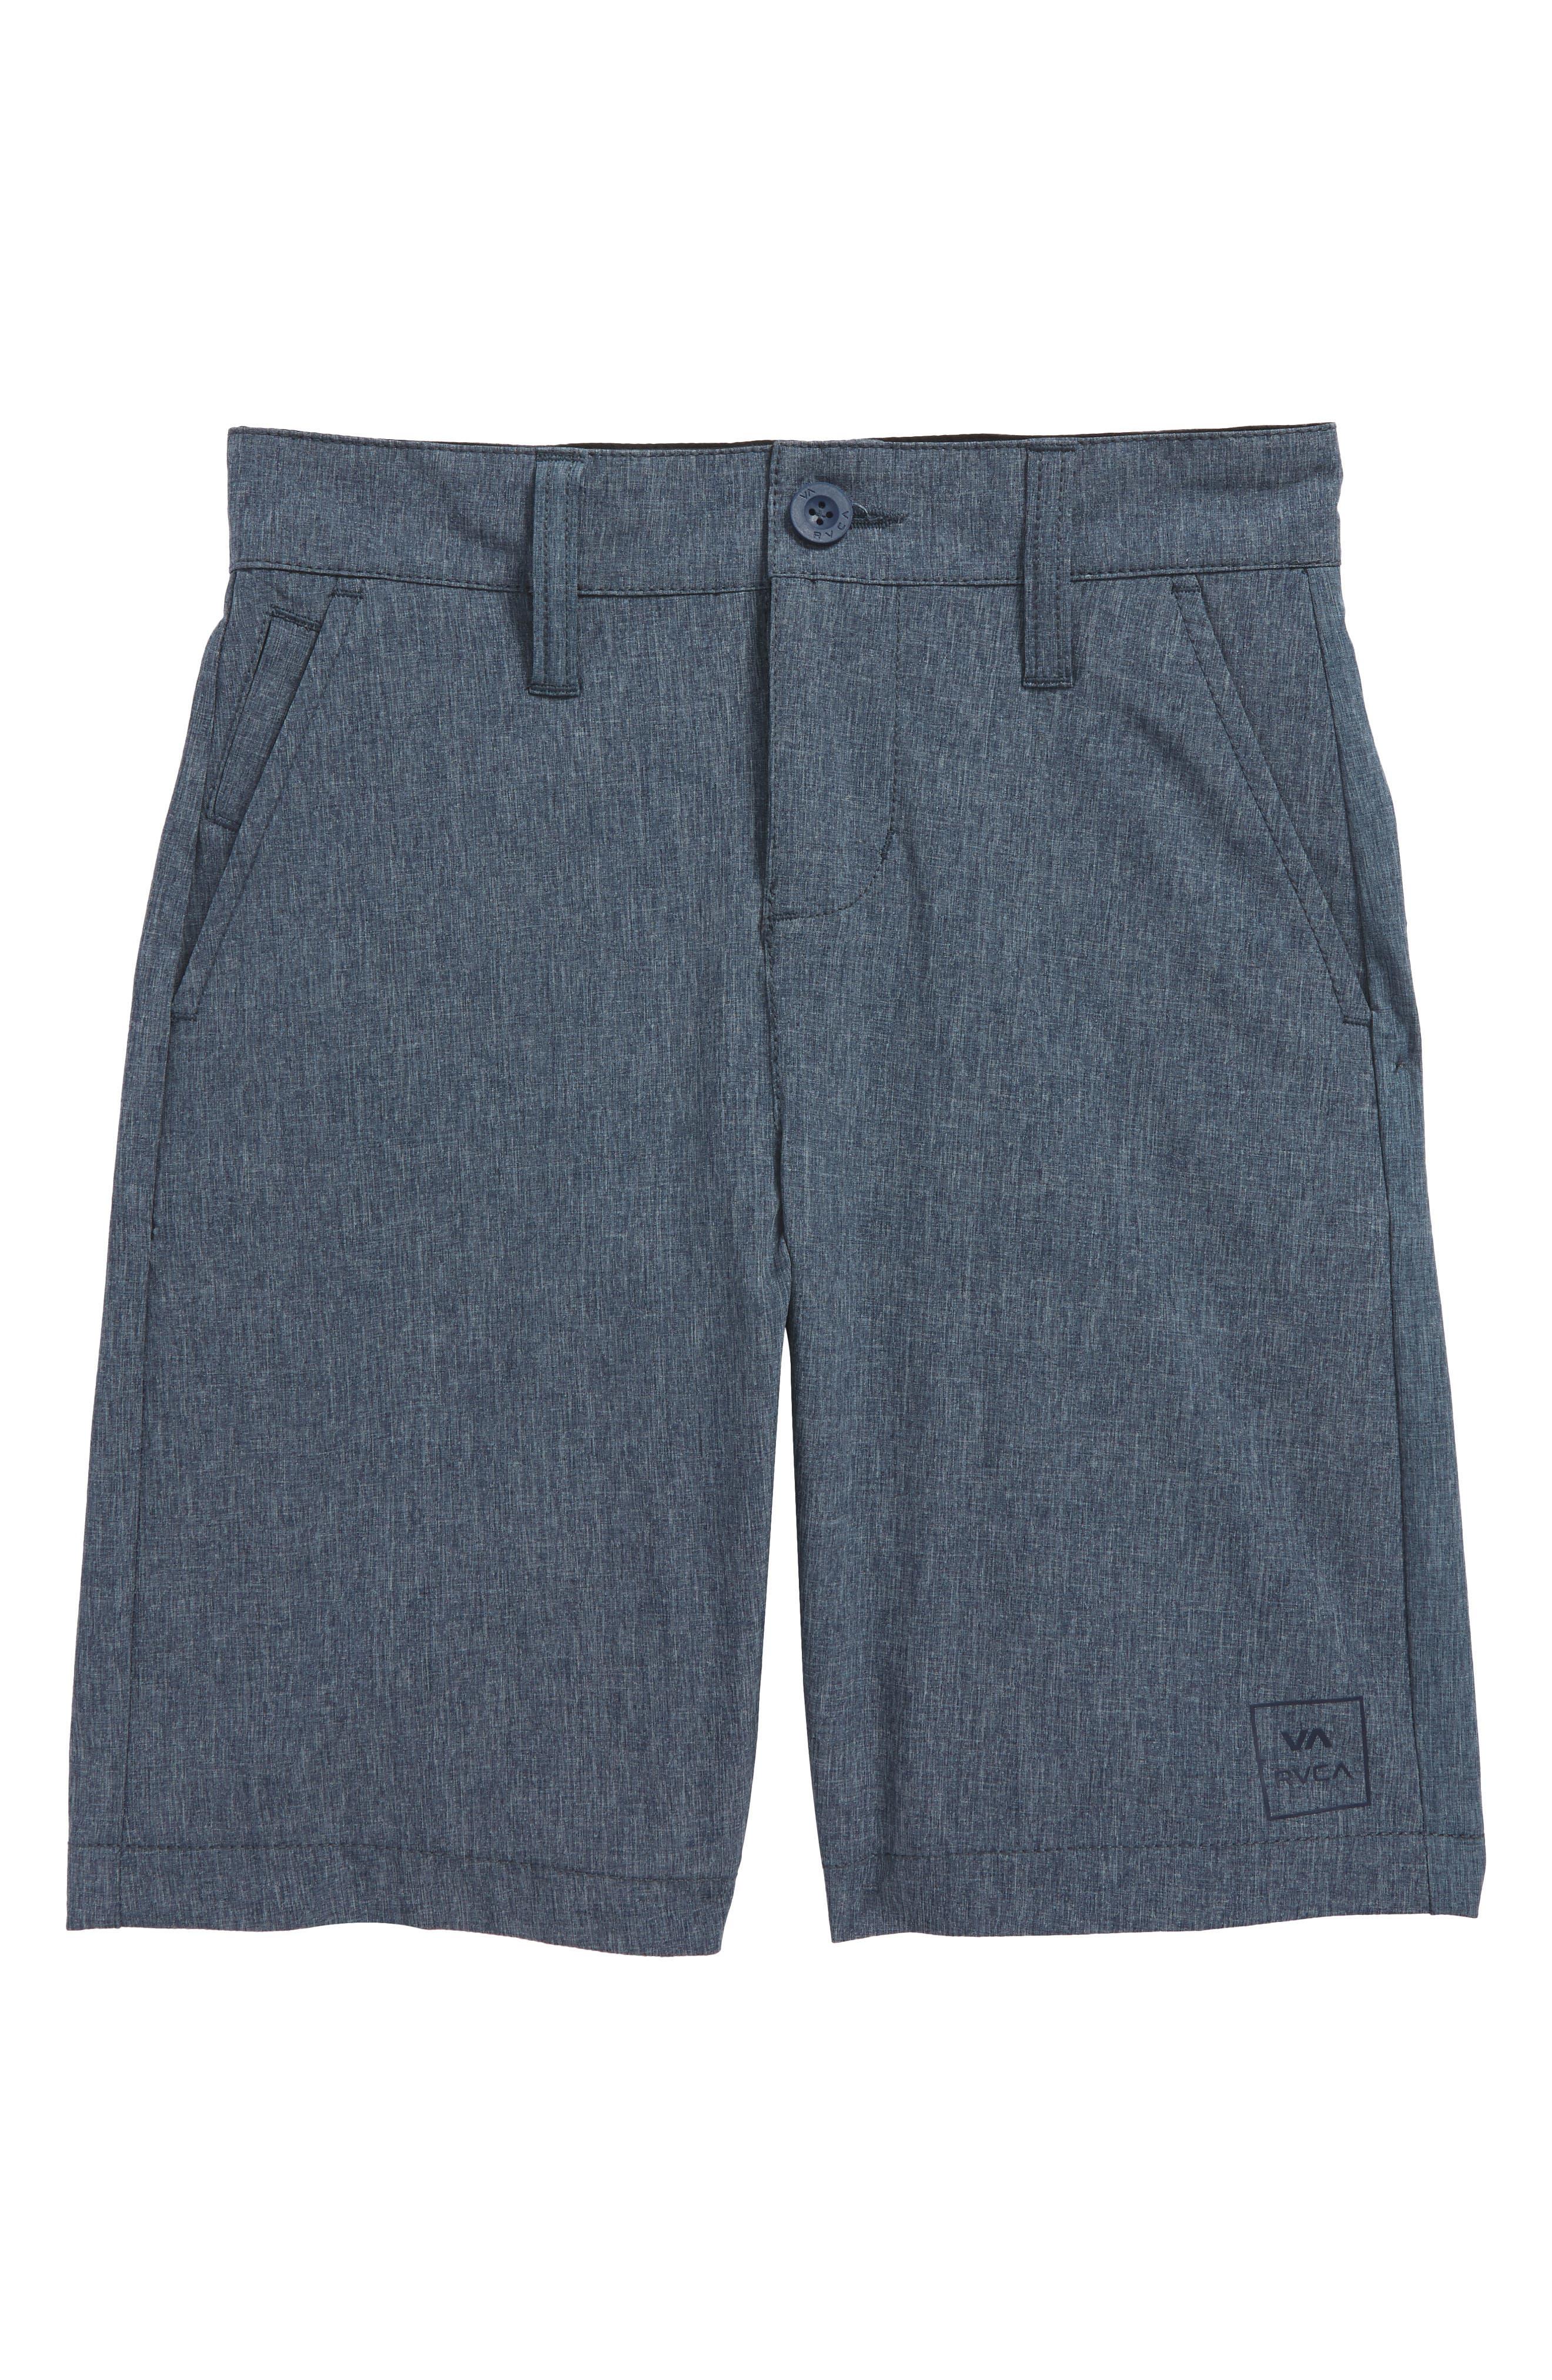 All the Way Hybrid Shorts,                             Main thumbnail 1, color,                             Classic Indigo